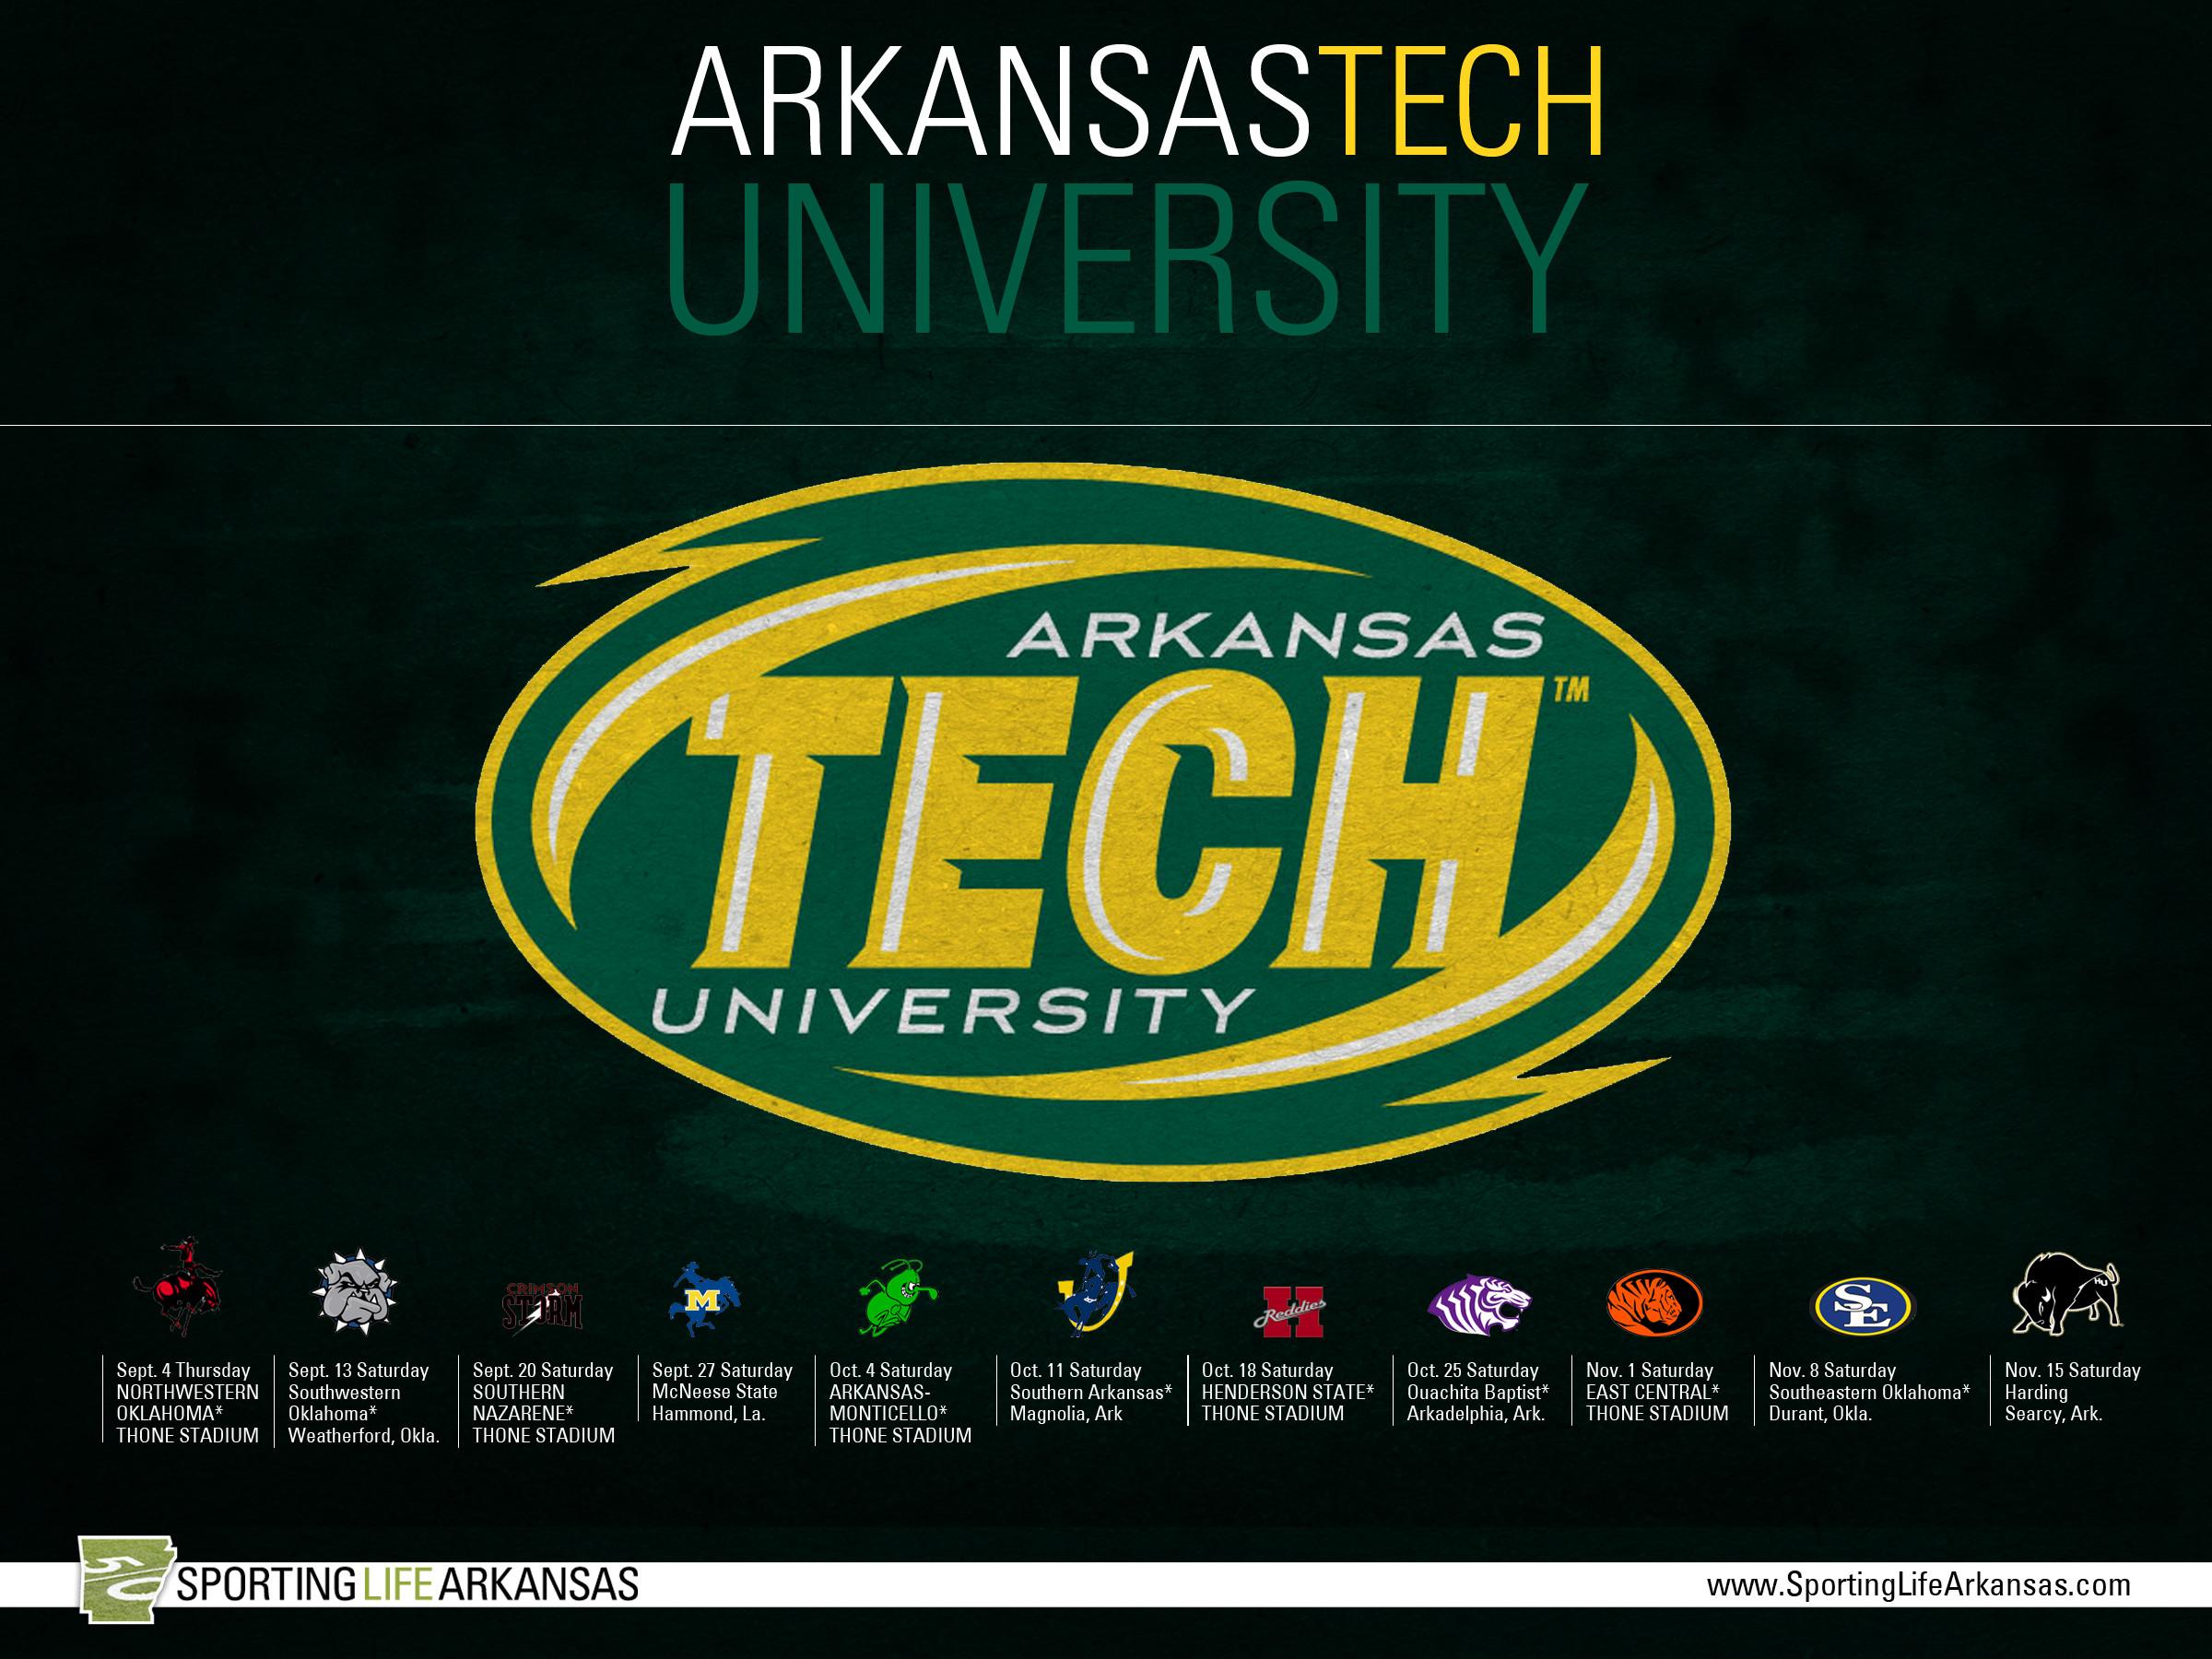 Arkansas Razorbacks Iphone Wallpaper Tennessee Ut Football Wallpaper 66 Images